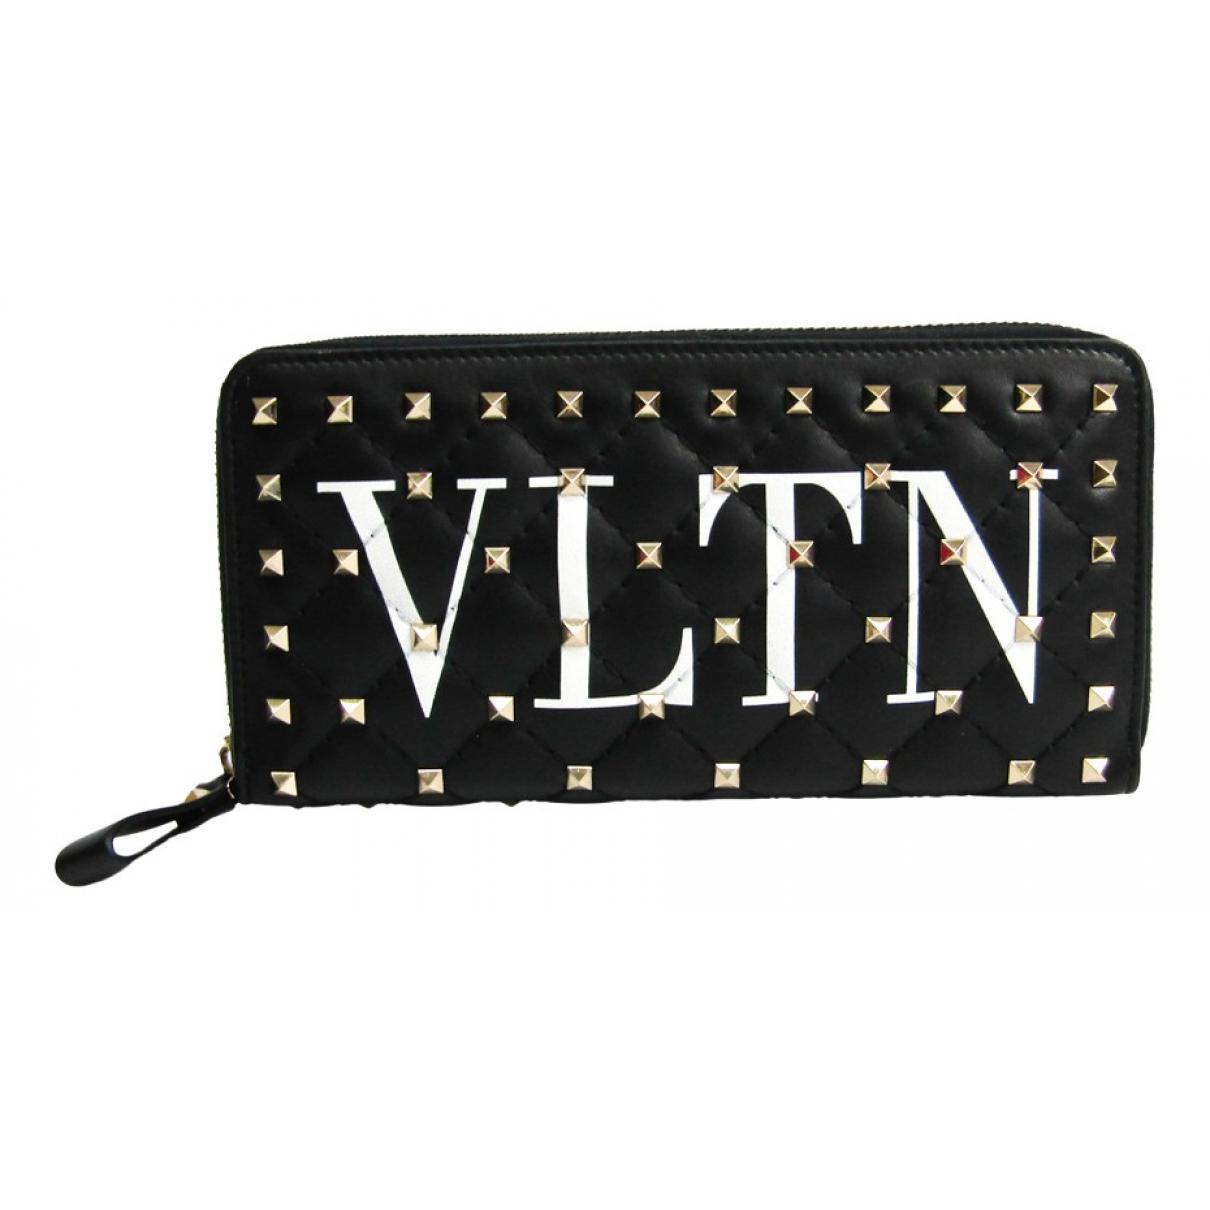 Valentino Garavani N Black Leather wallet for Women N